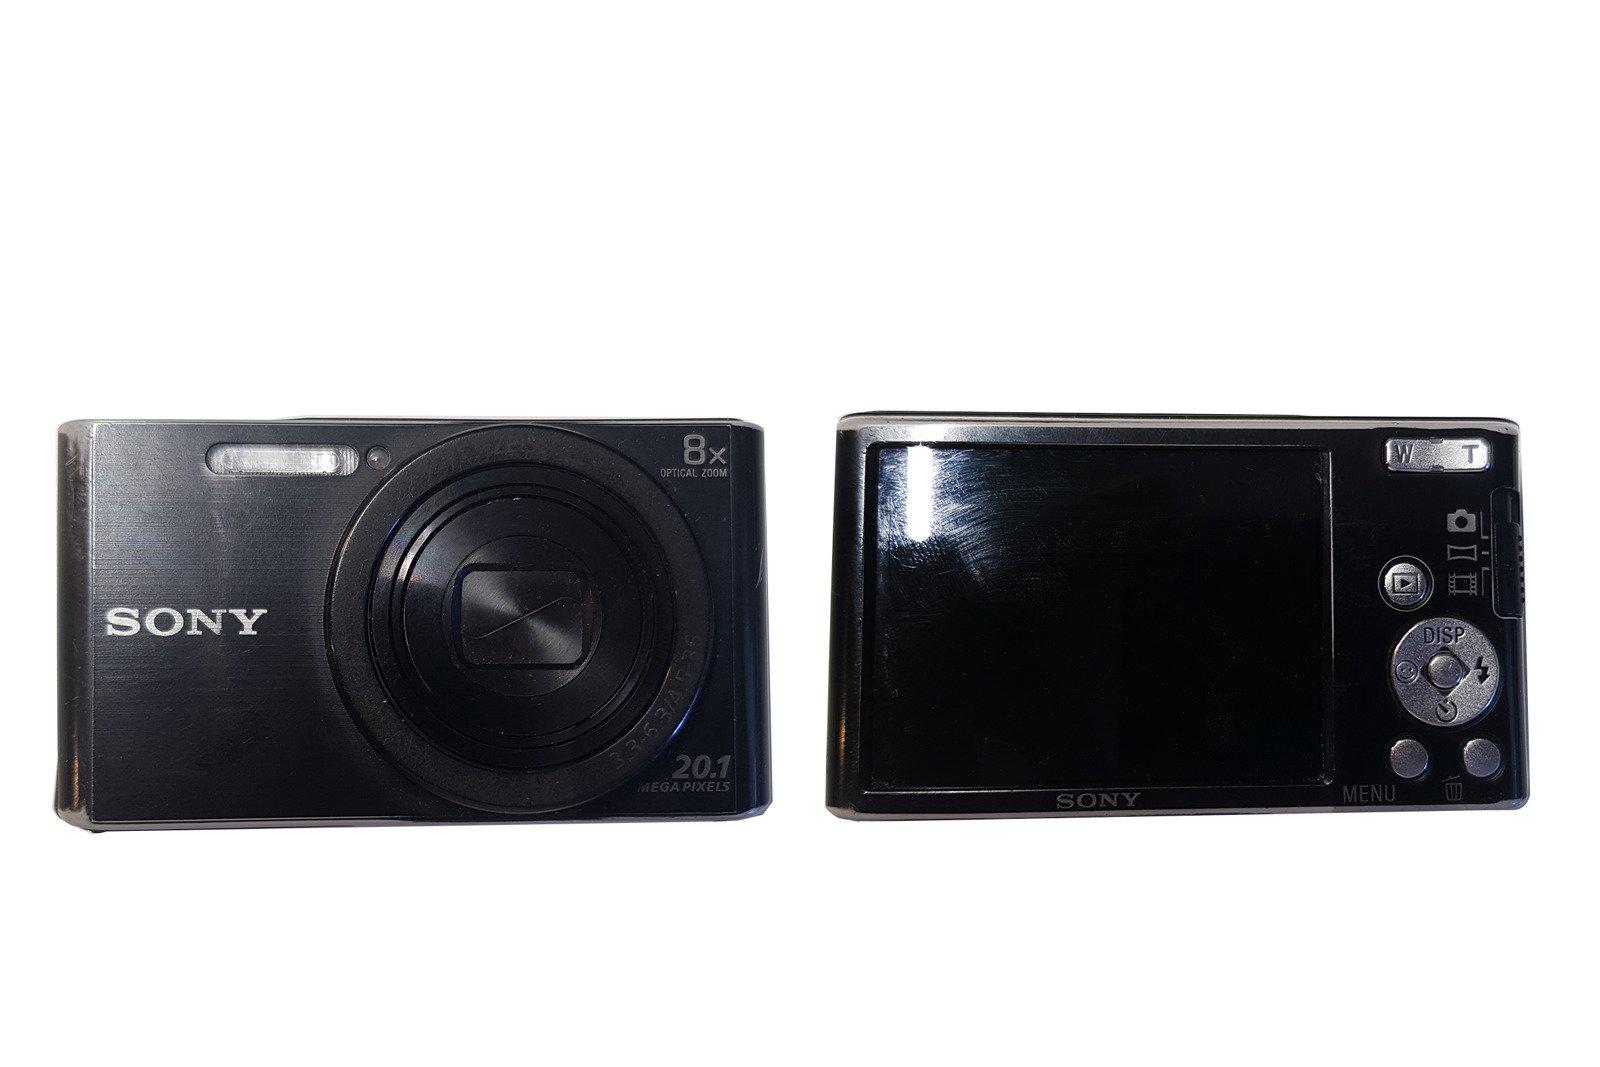 Sony Cyber-shot DSC-W830 Compat Camera 20.1Mpx Zoom 8x Black Grade C